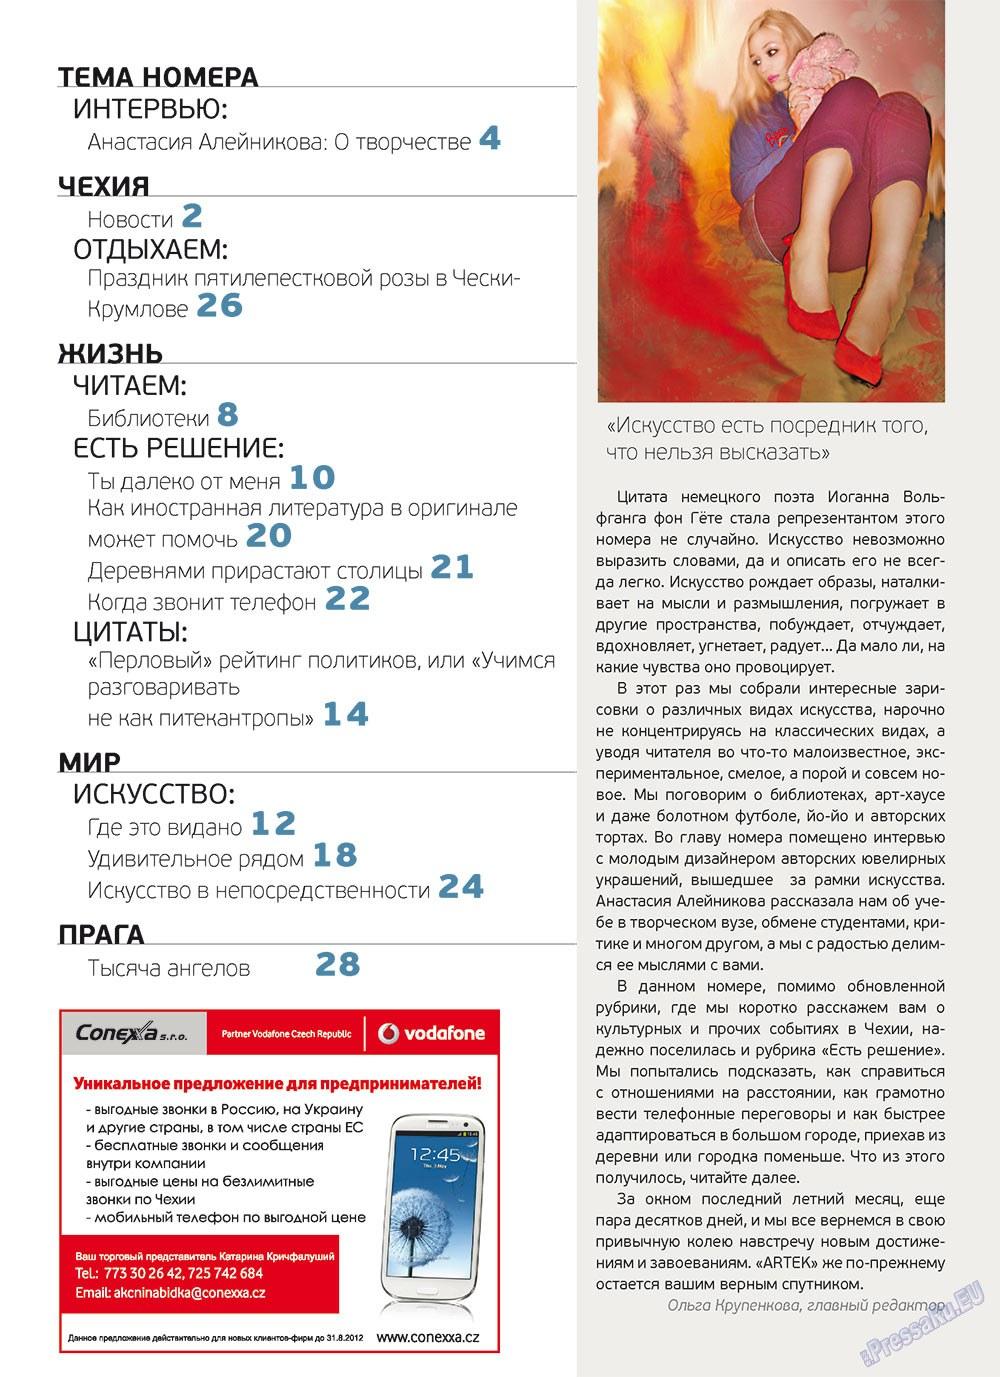 Артек (журнал). 2012 год, номер 3, стр. 3